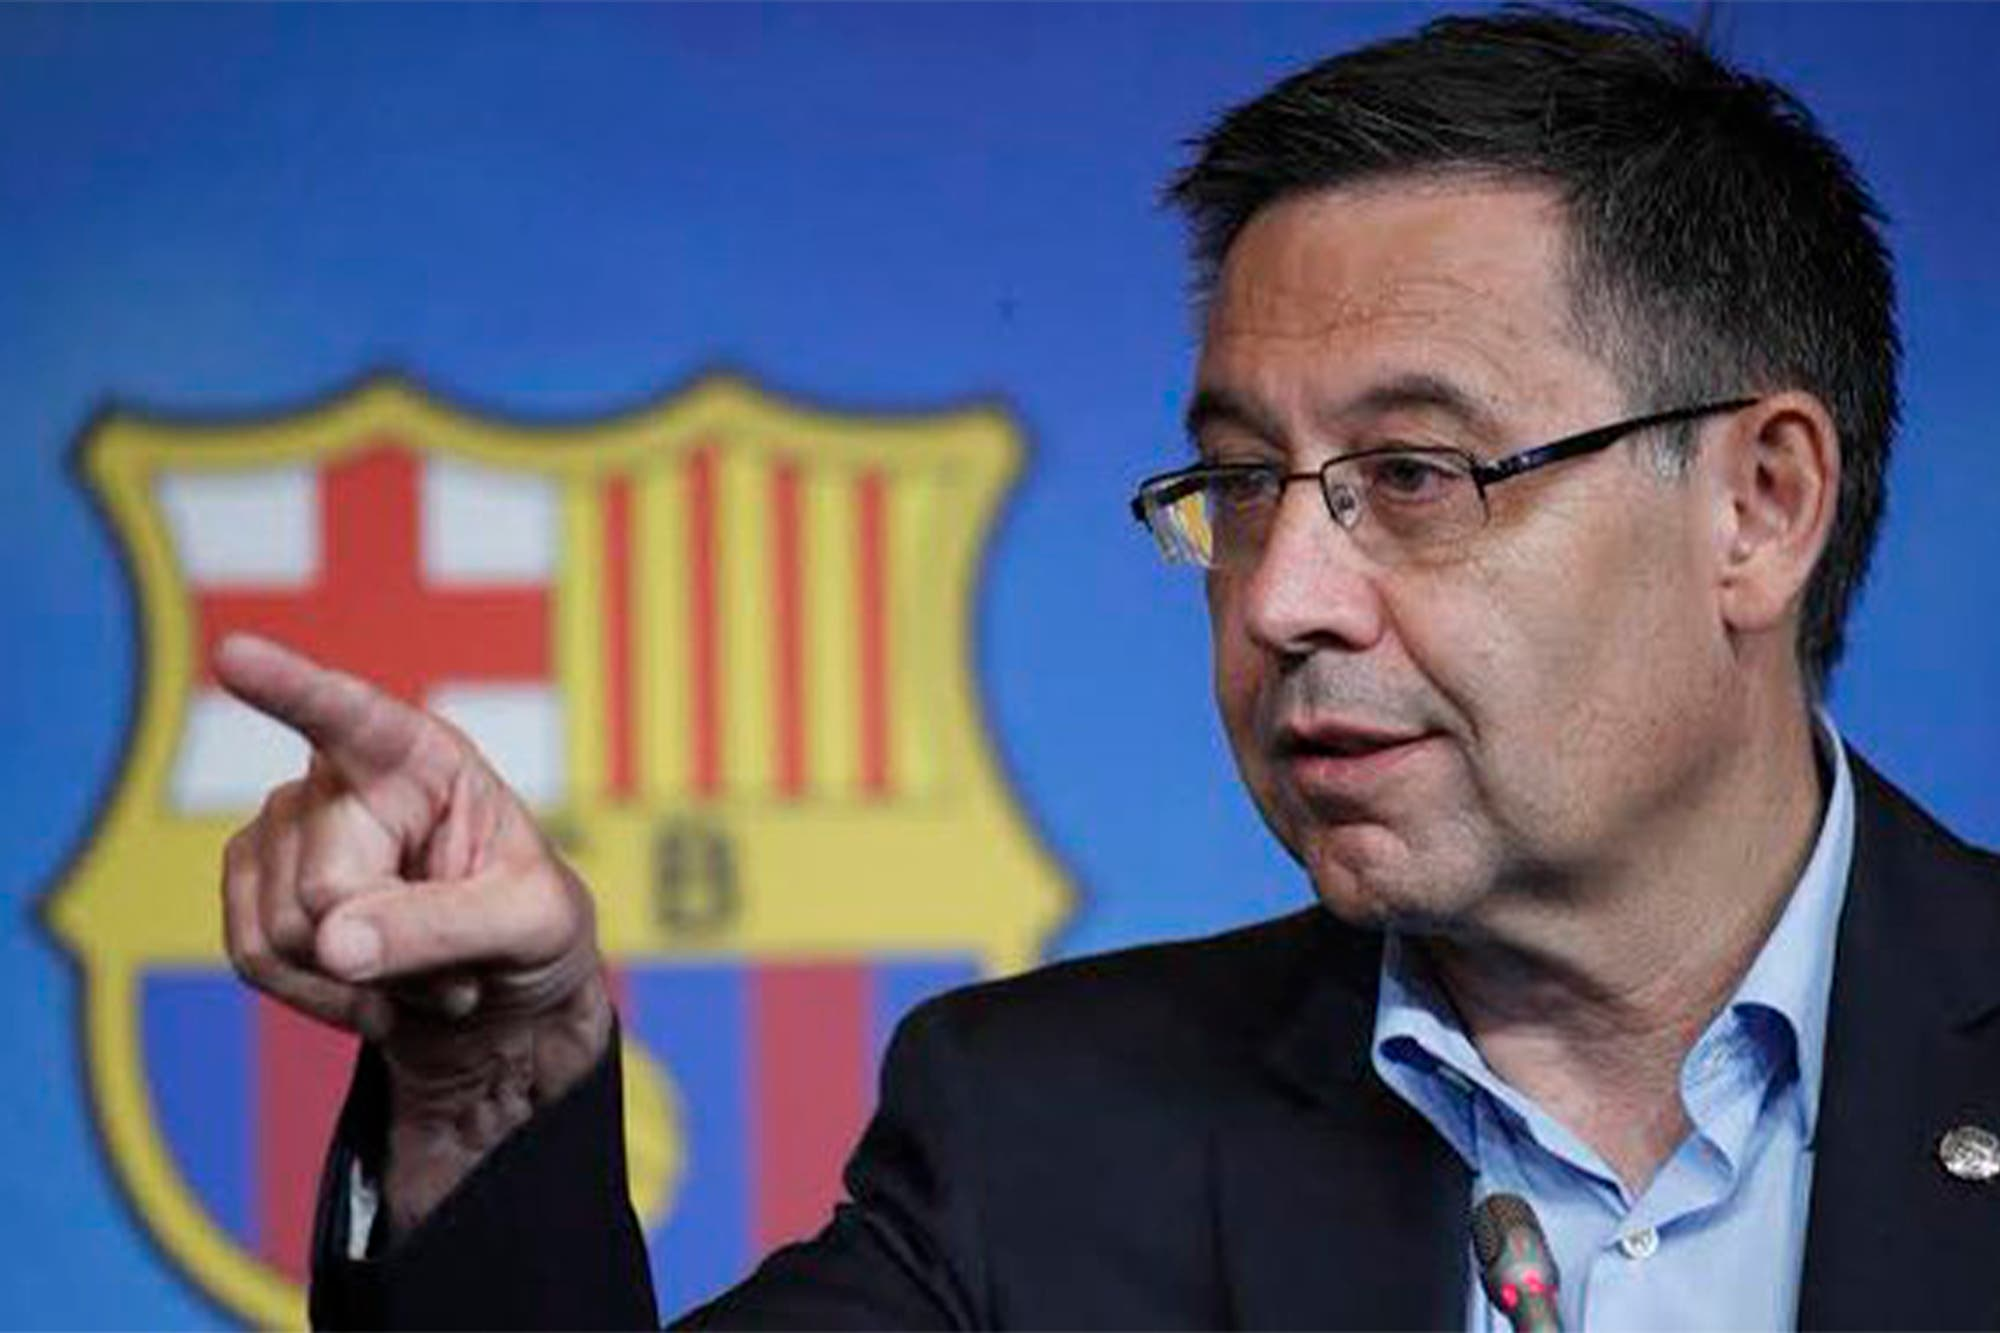 barcelona:-detuvieron-a-josep-maria-bartomeu,-ex-presidente-del-club